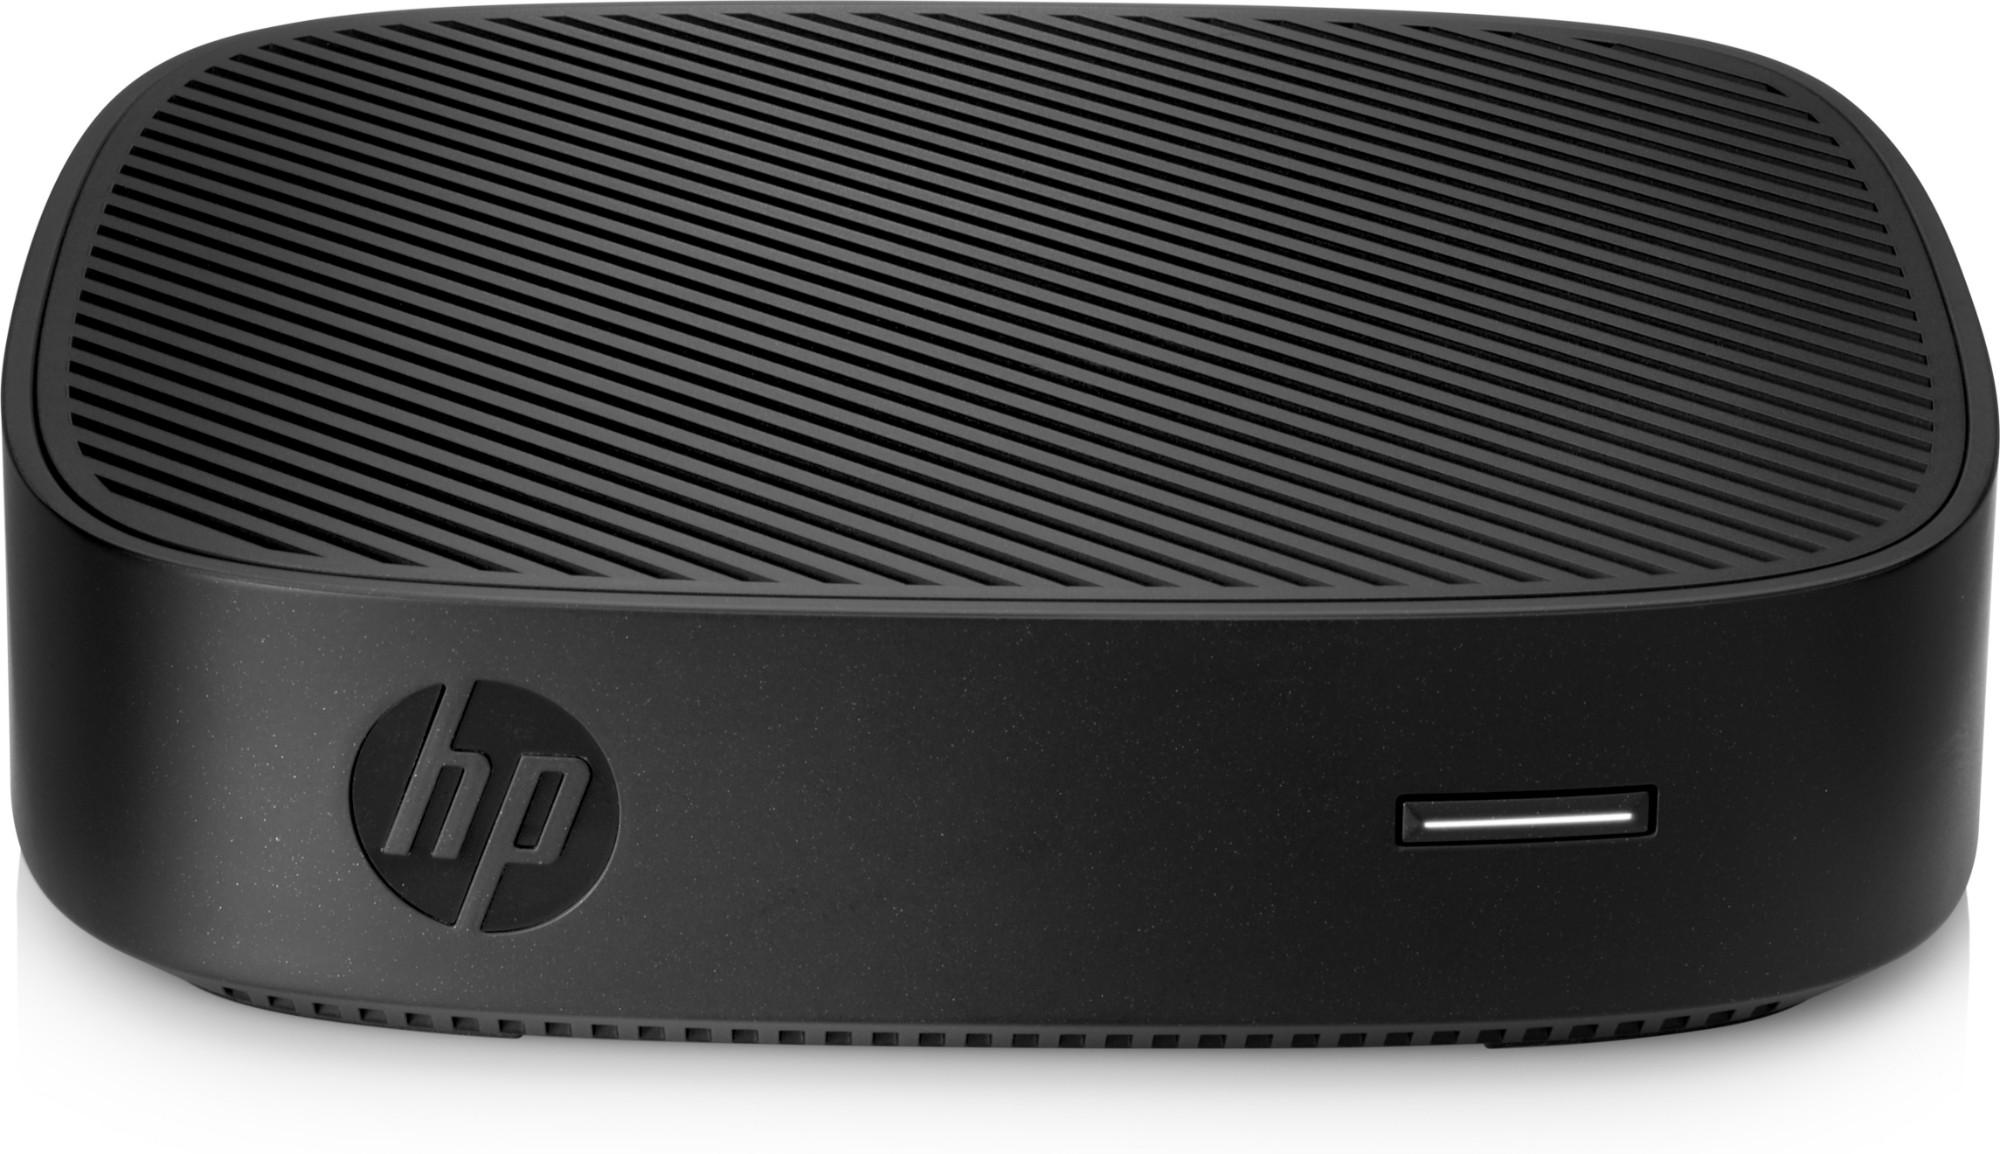 HP t430 Thin Client (2UE29AV) 1,1 GHz N4000 Negro ThinPro 740 g